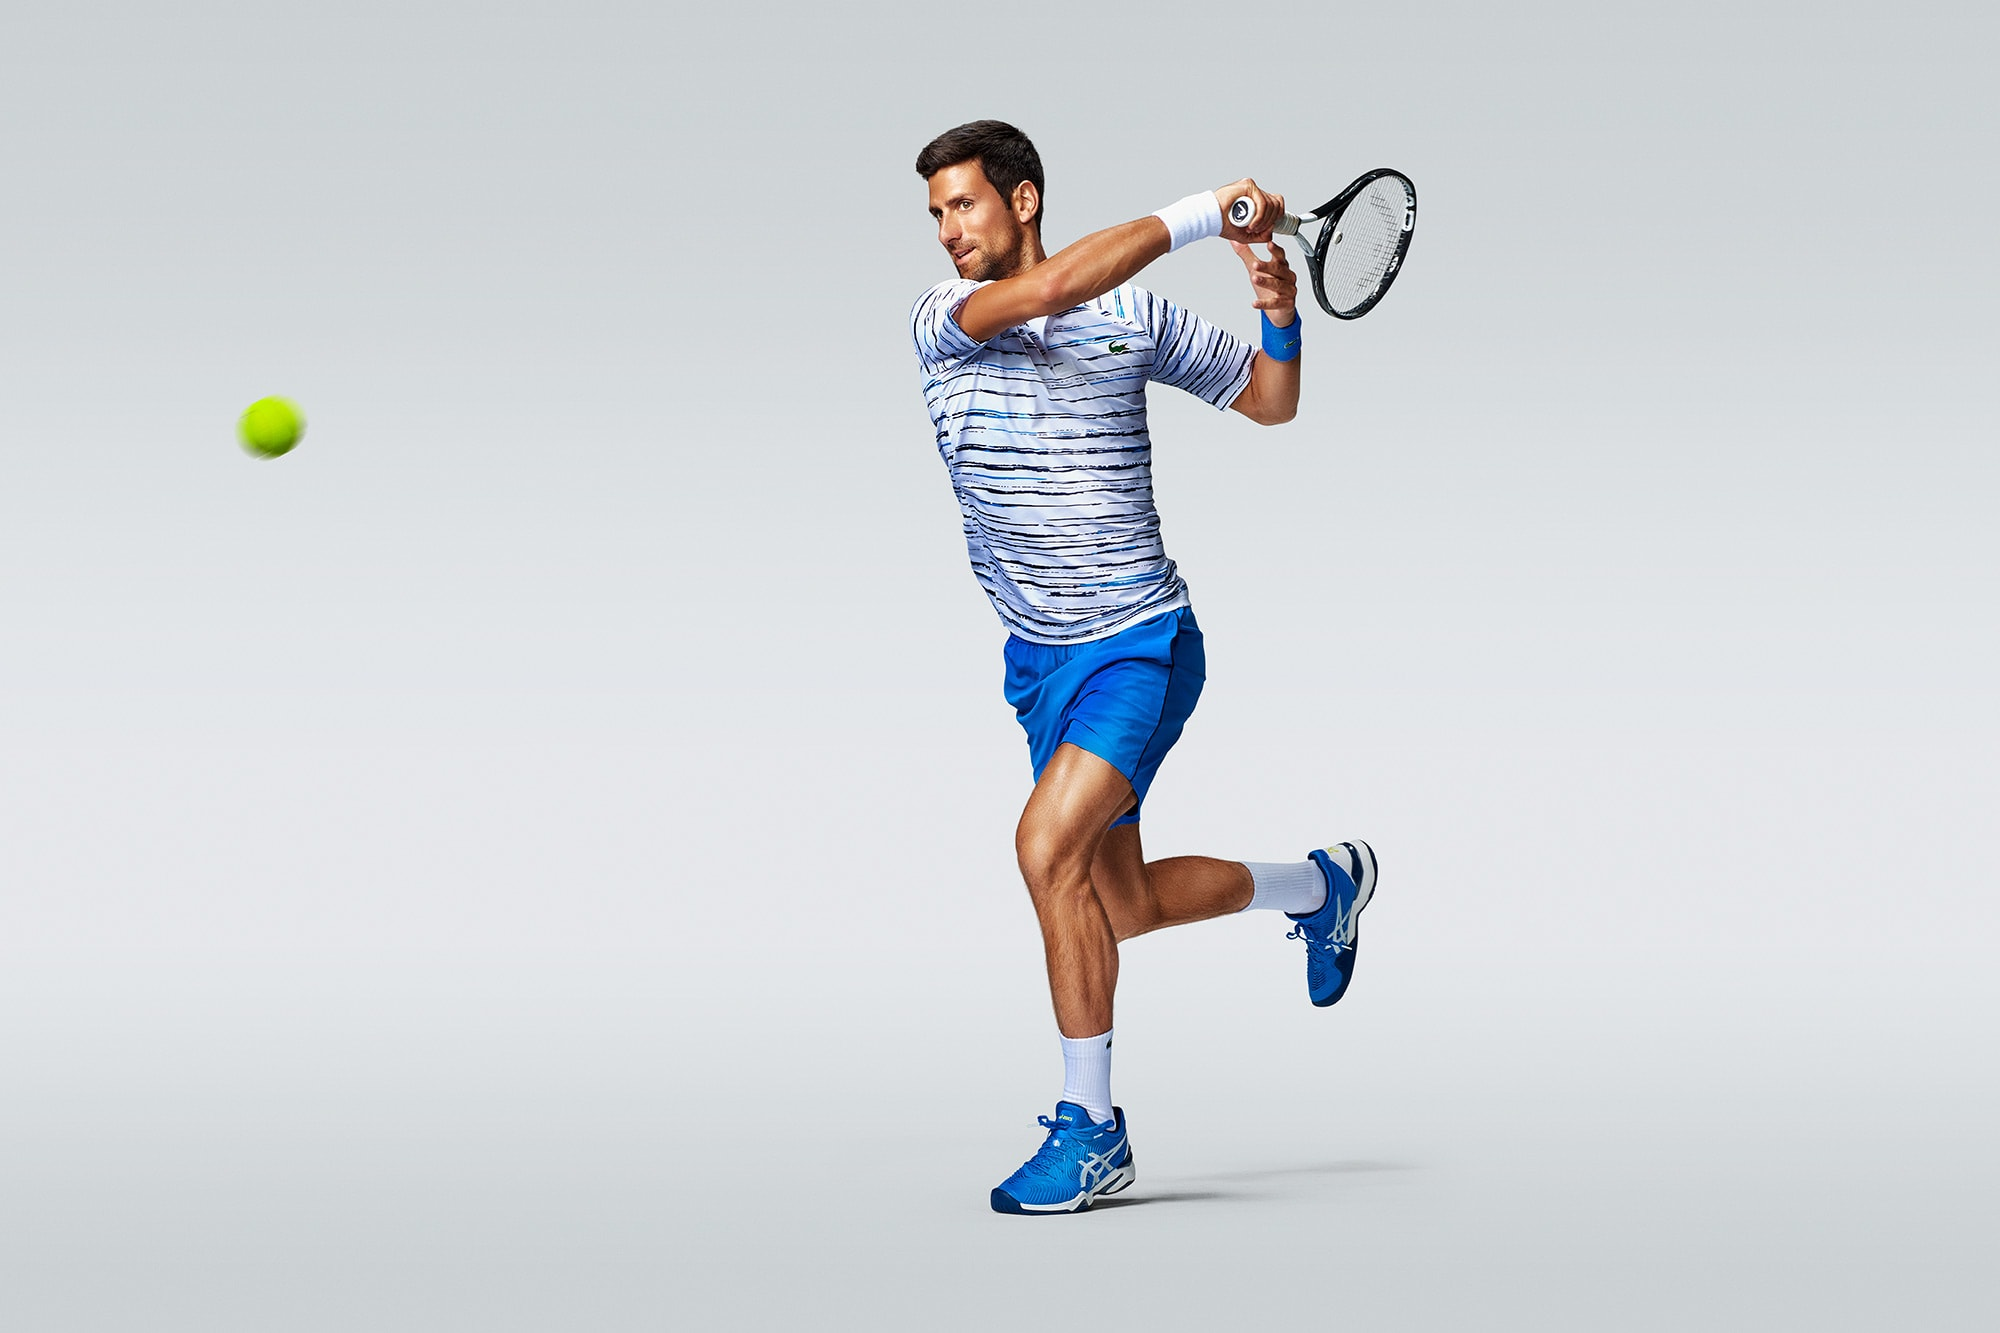 asics tennis campaign of world number one novak djokovic